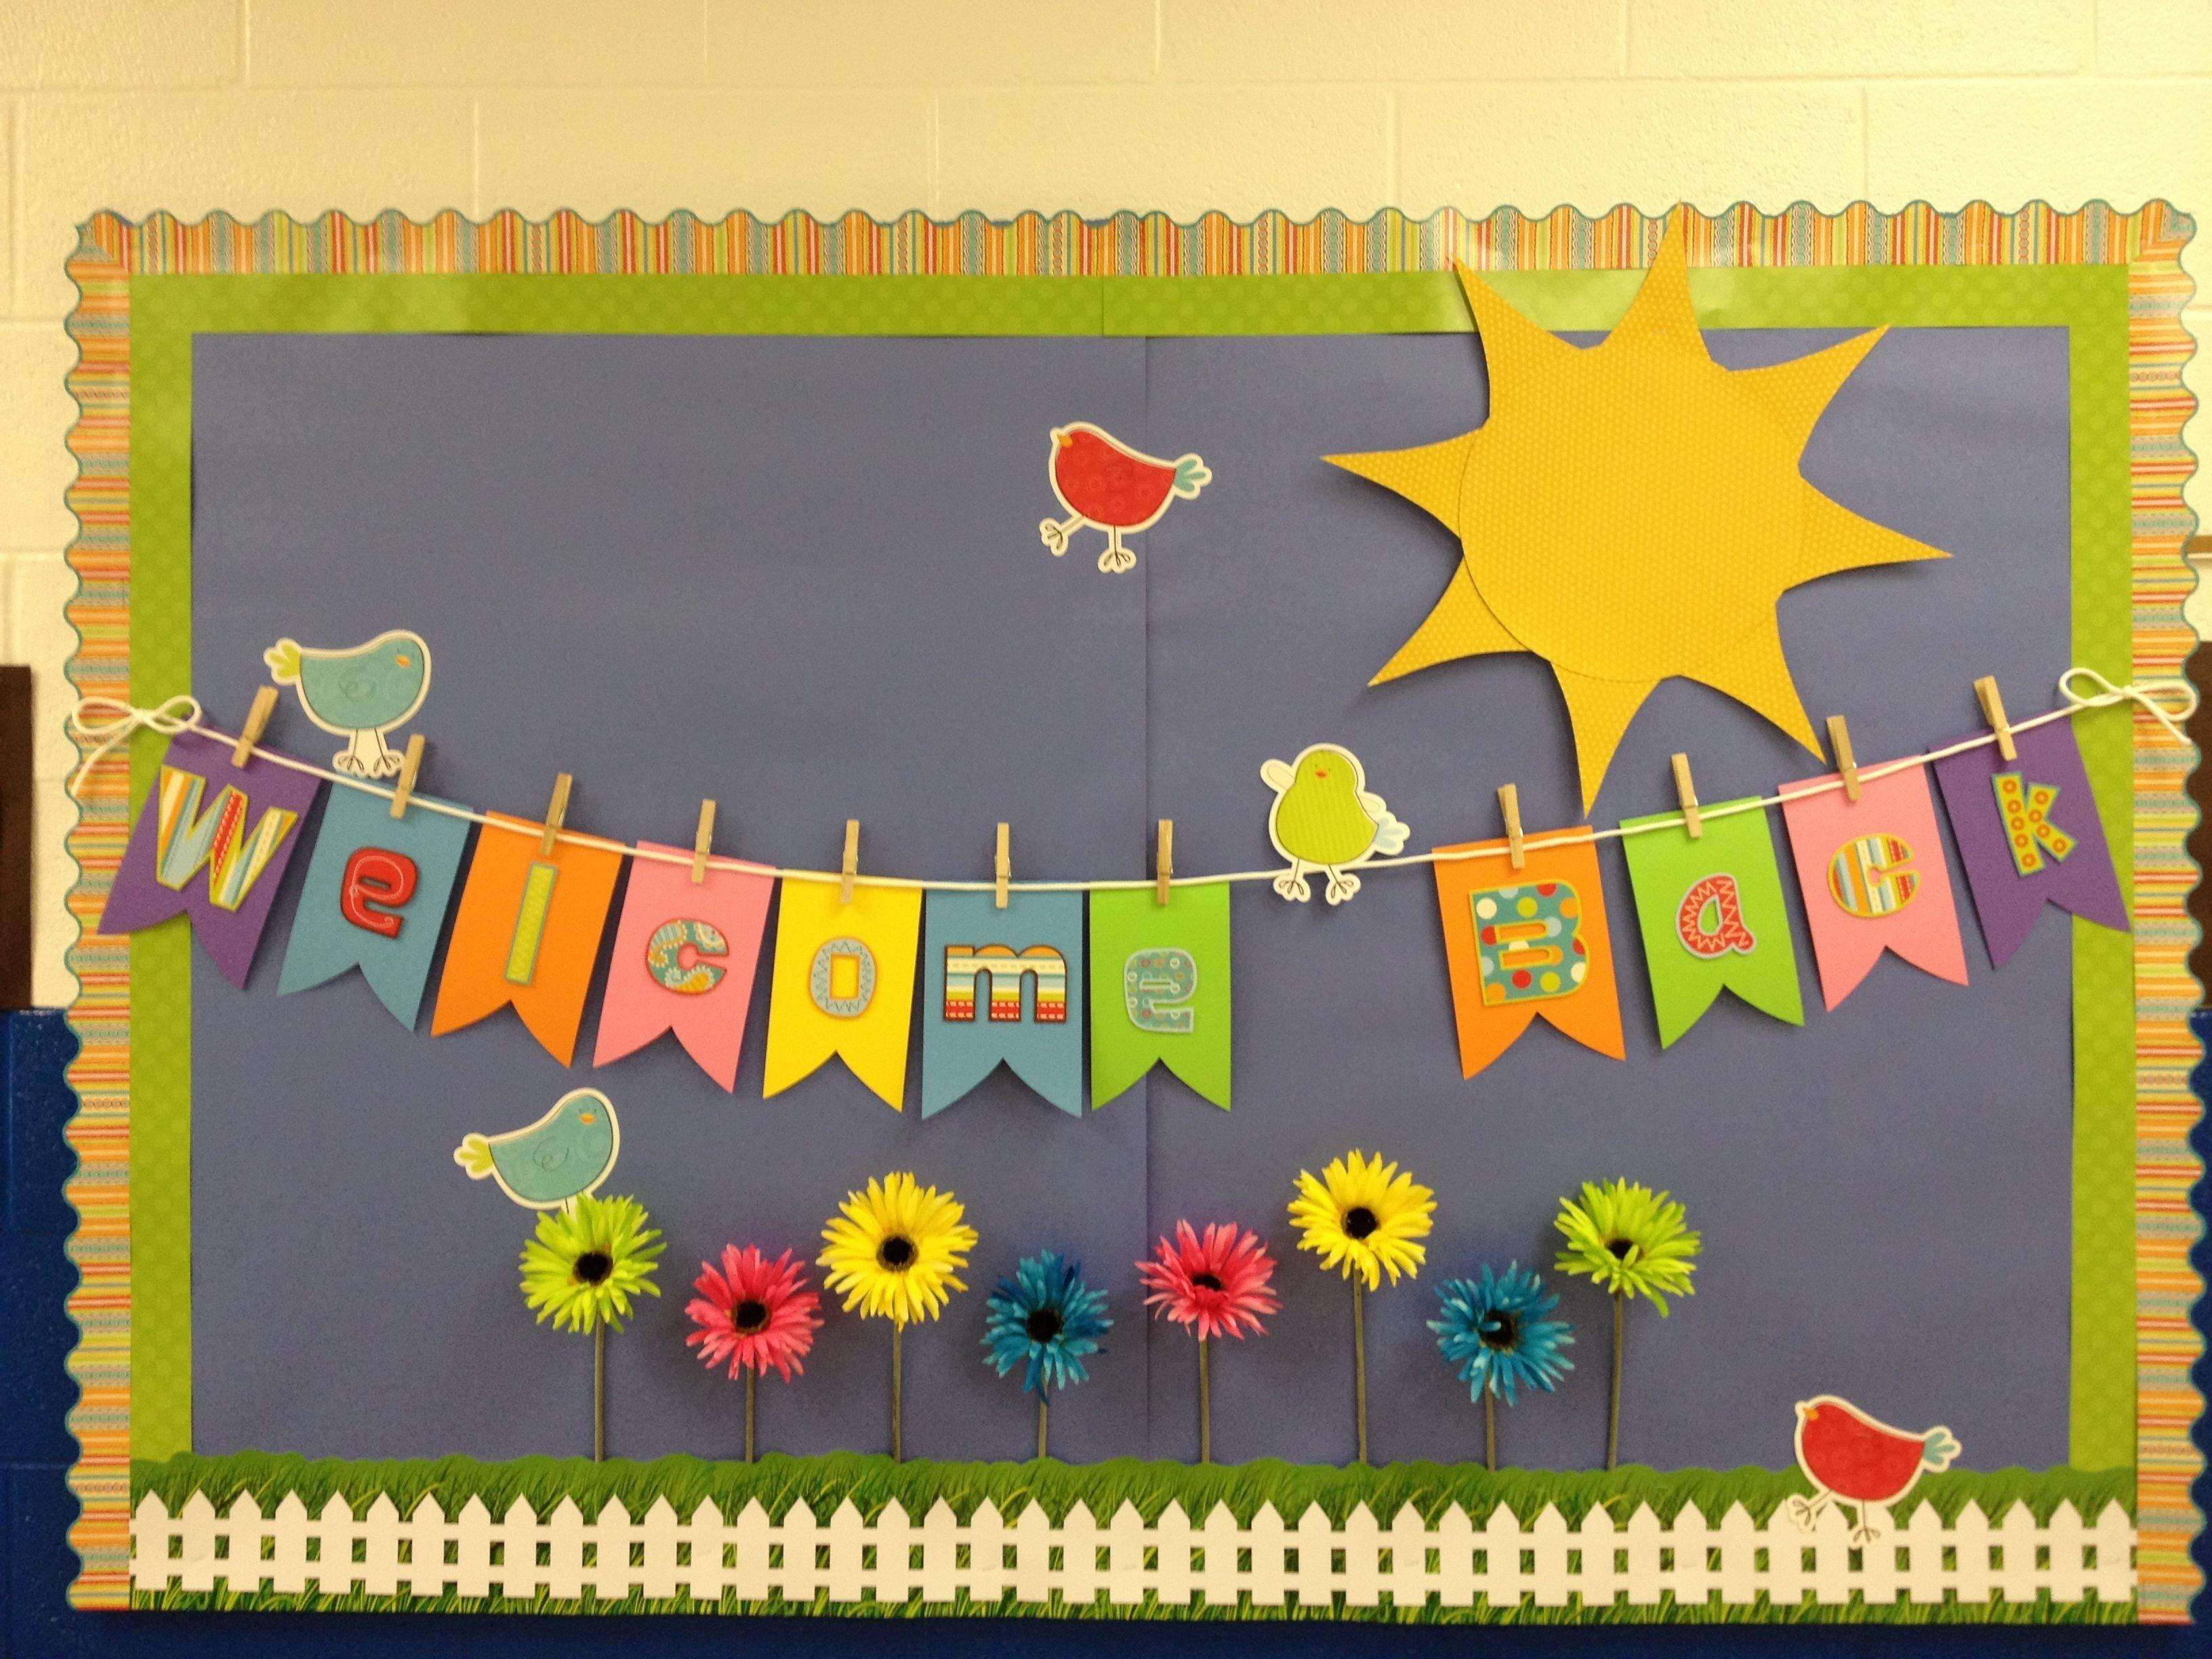 10 Wonderful Beginning Of The Year Bulletin Board Ideas spring theme welcome back to school bulletin boards ideas bing 9 2020